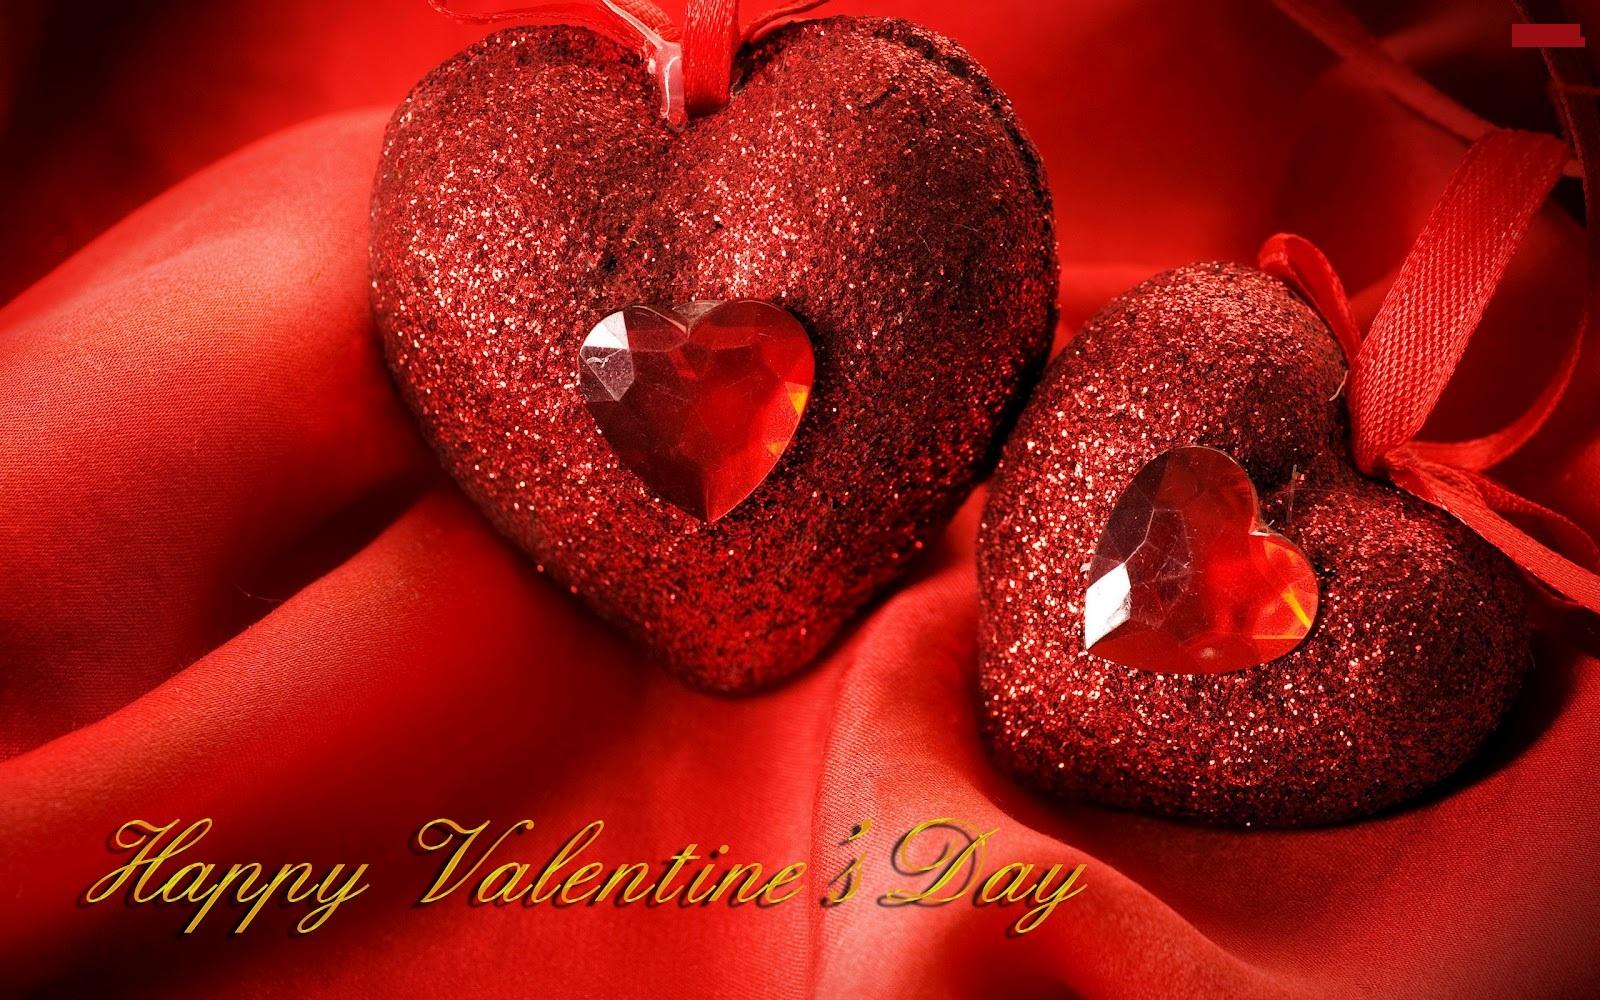 14 February 2018 Happy Valentines Day History 2018 Wishes Pics